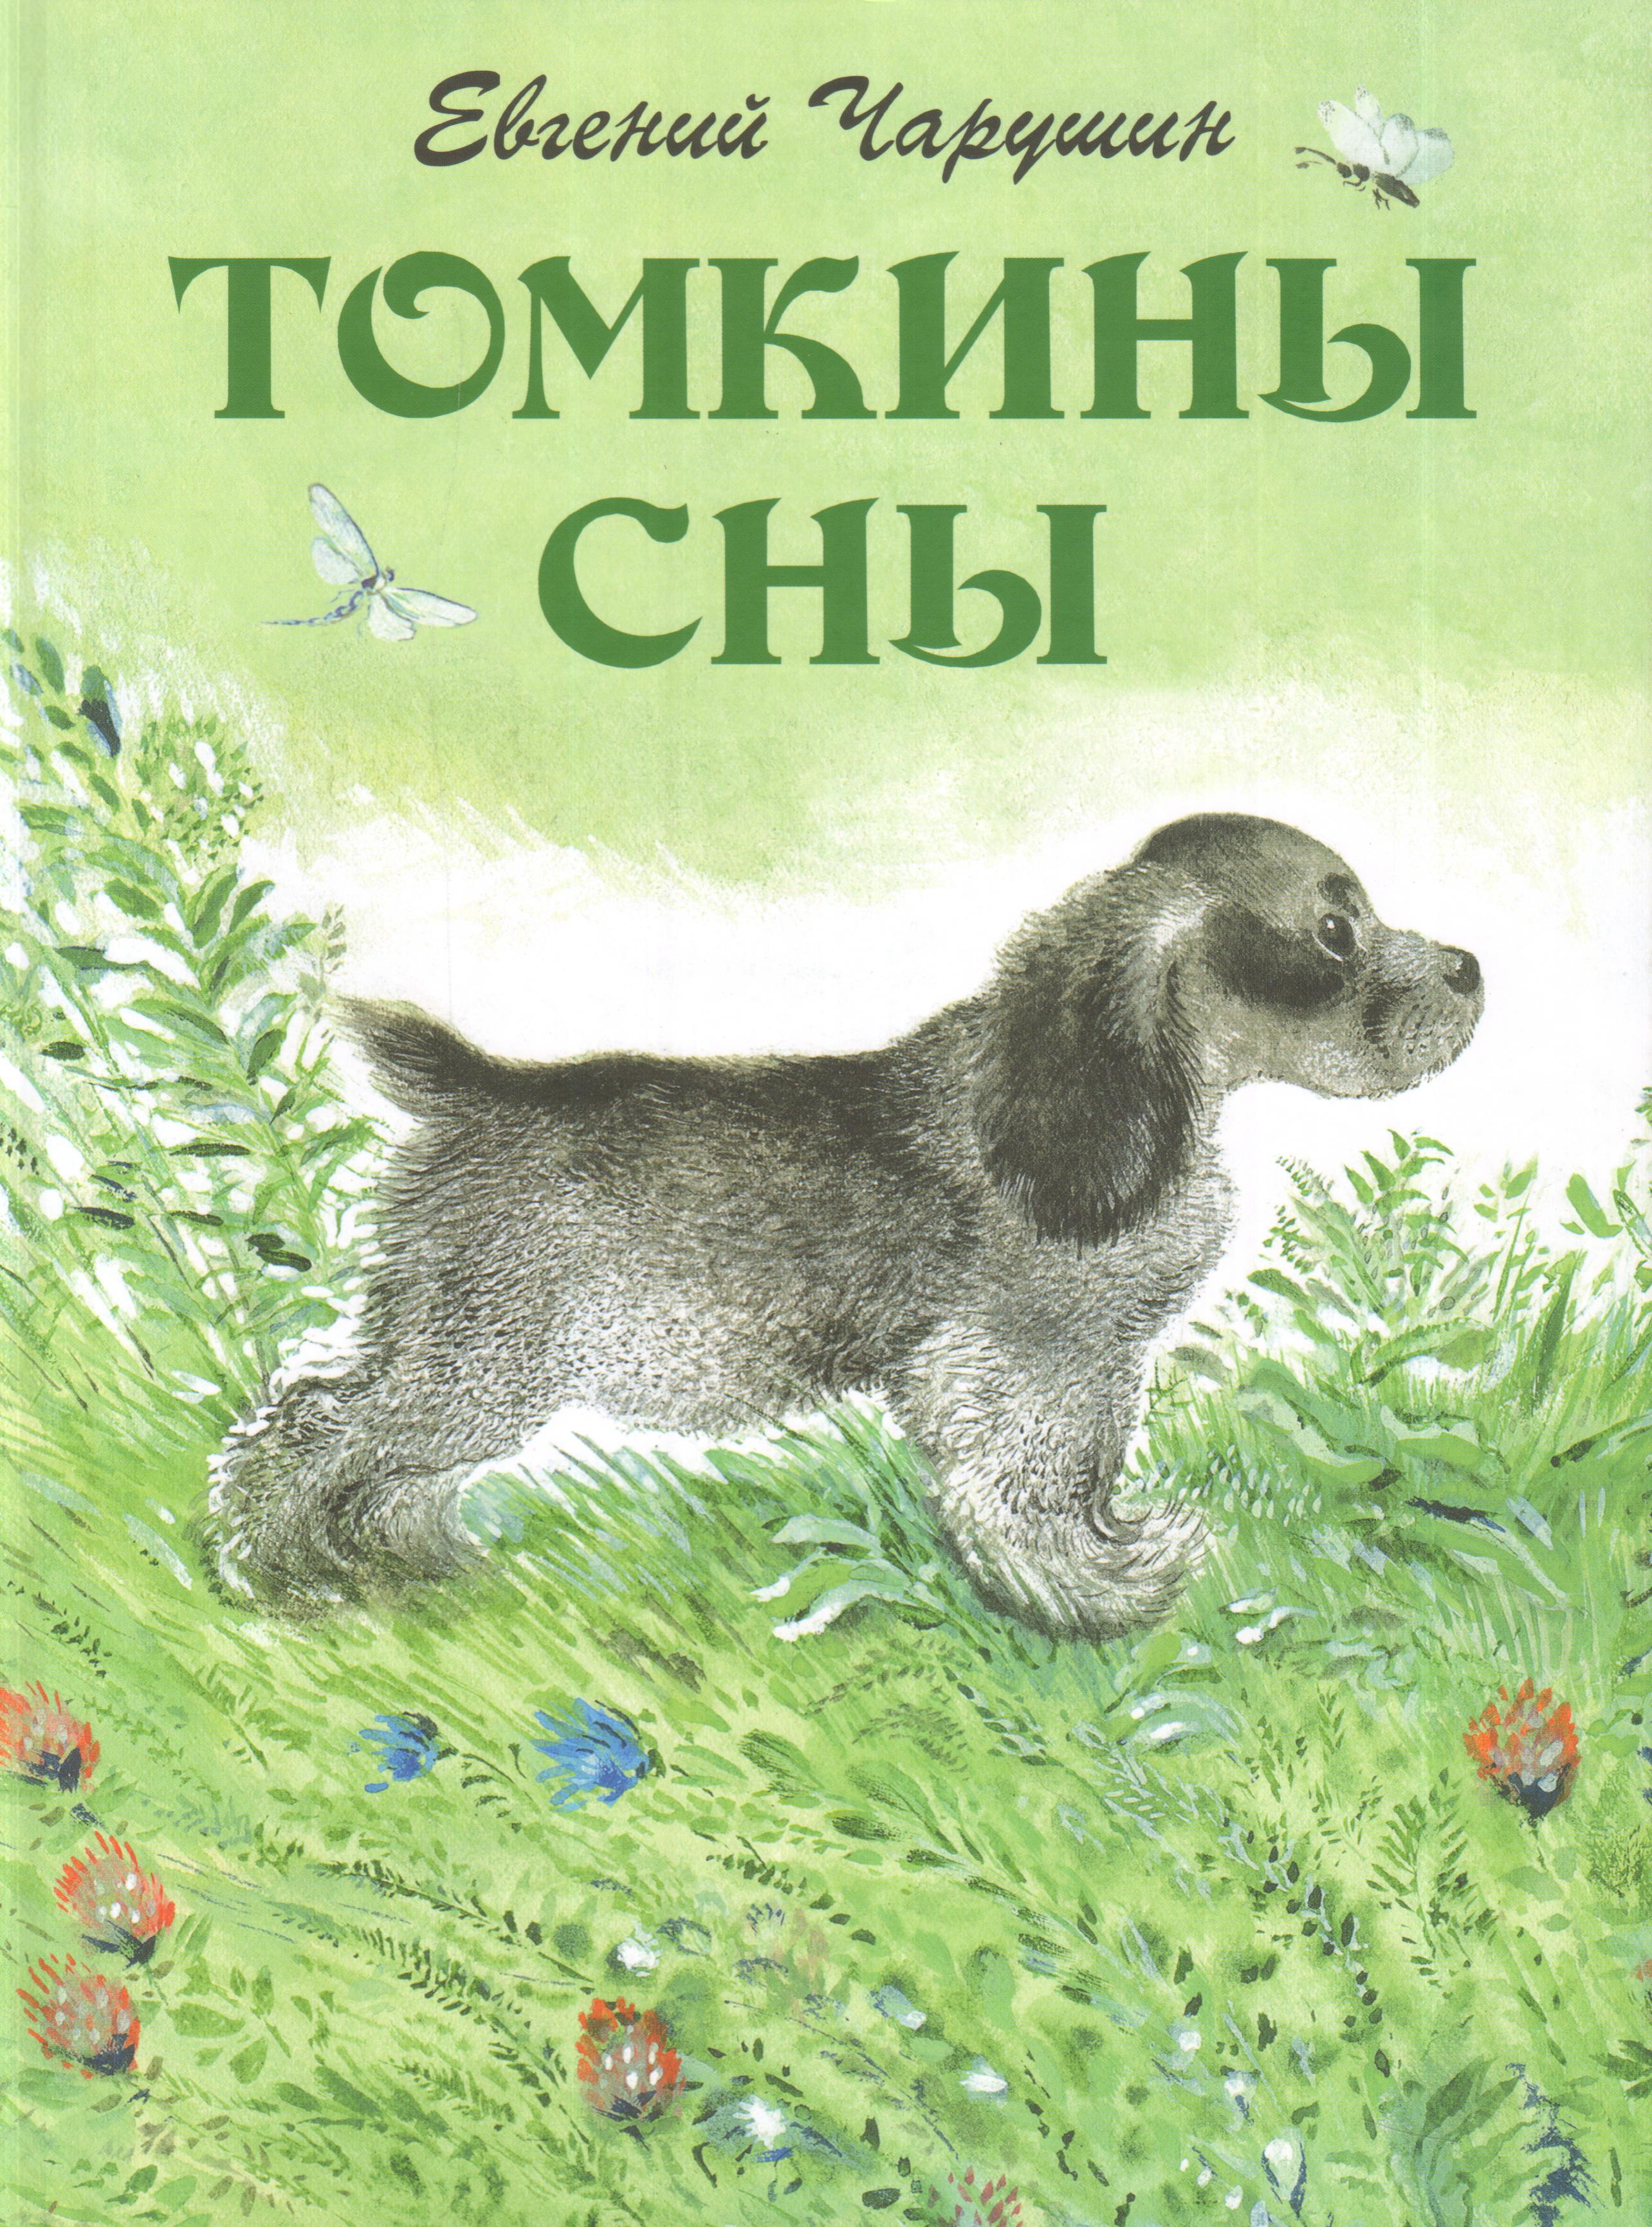 Надписями, картинки чарушина книги